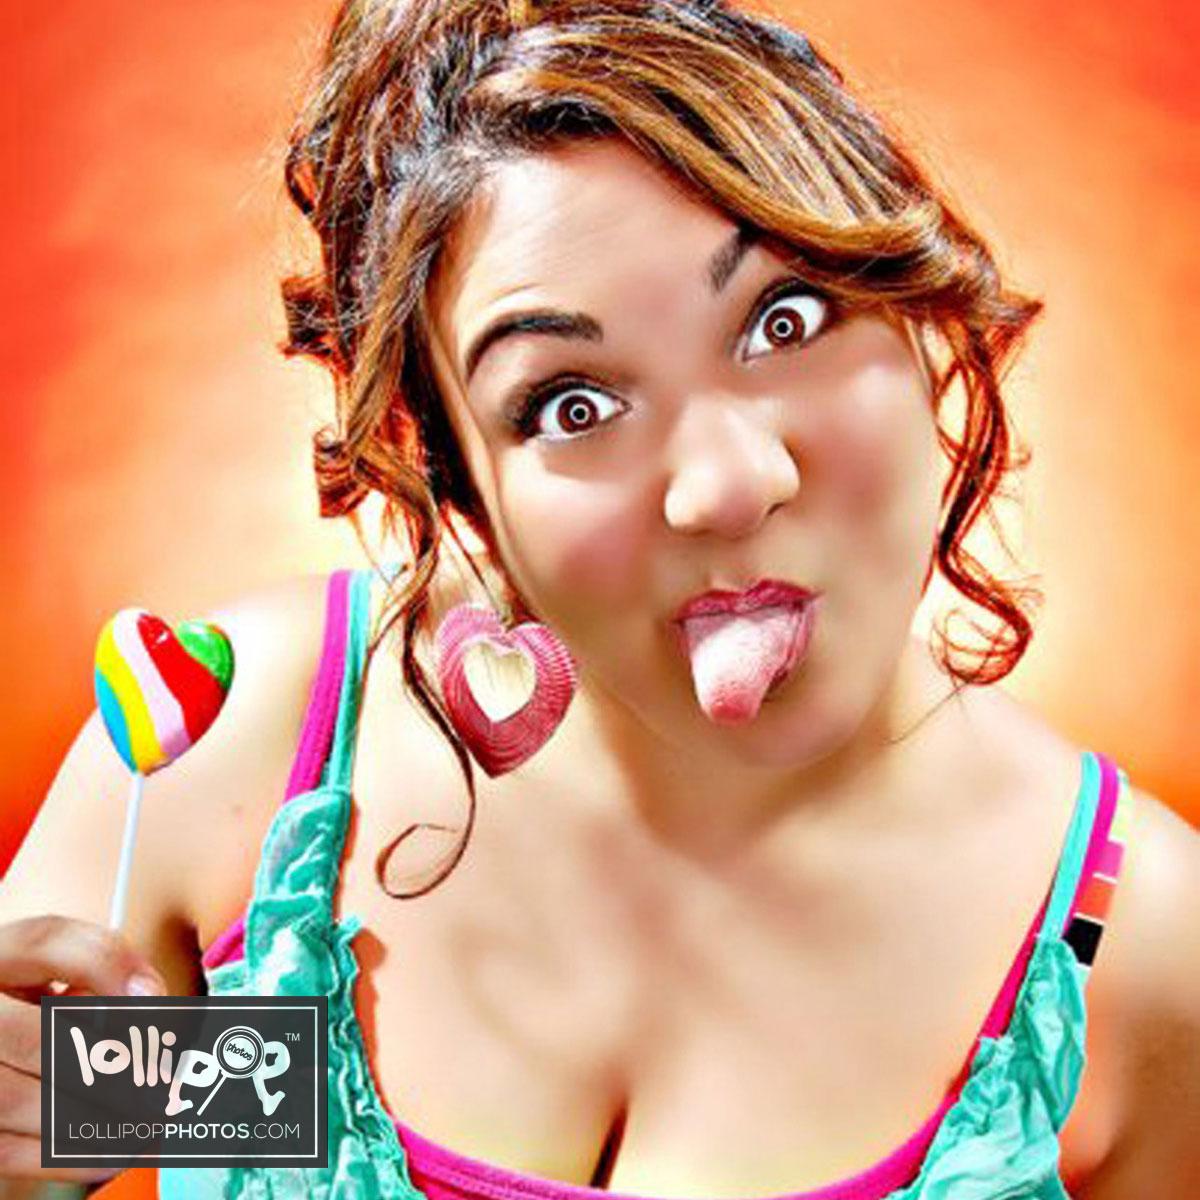 msdig-nora-canfield-lollipop-photos-007.jpg